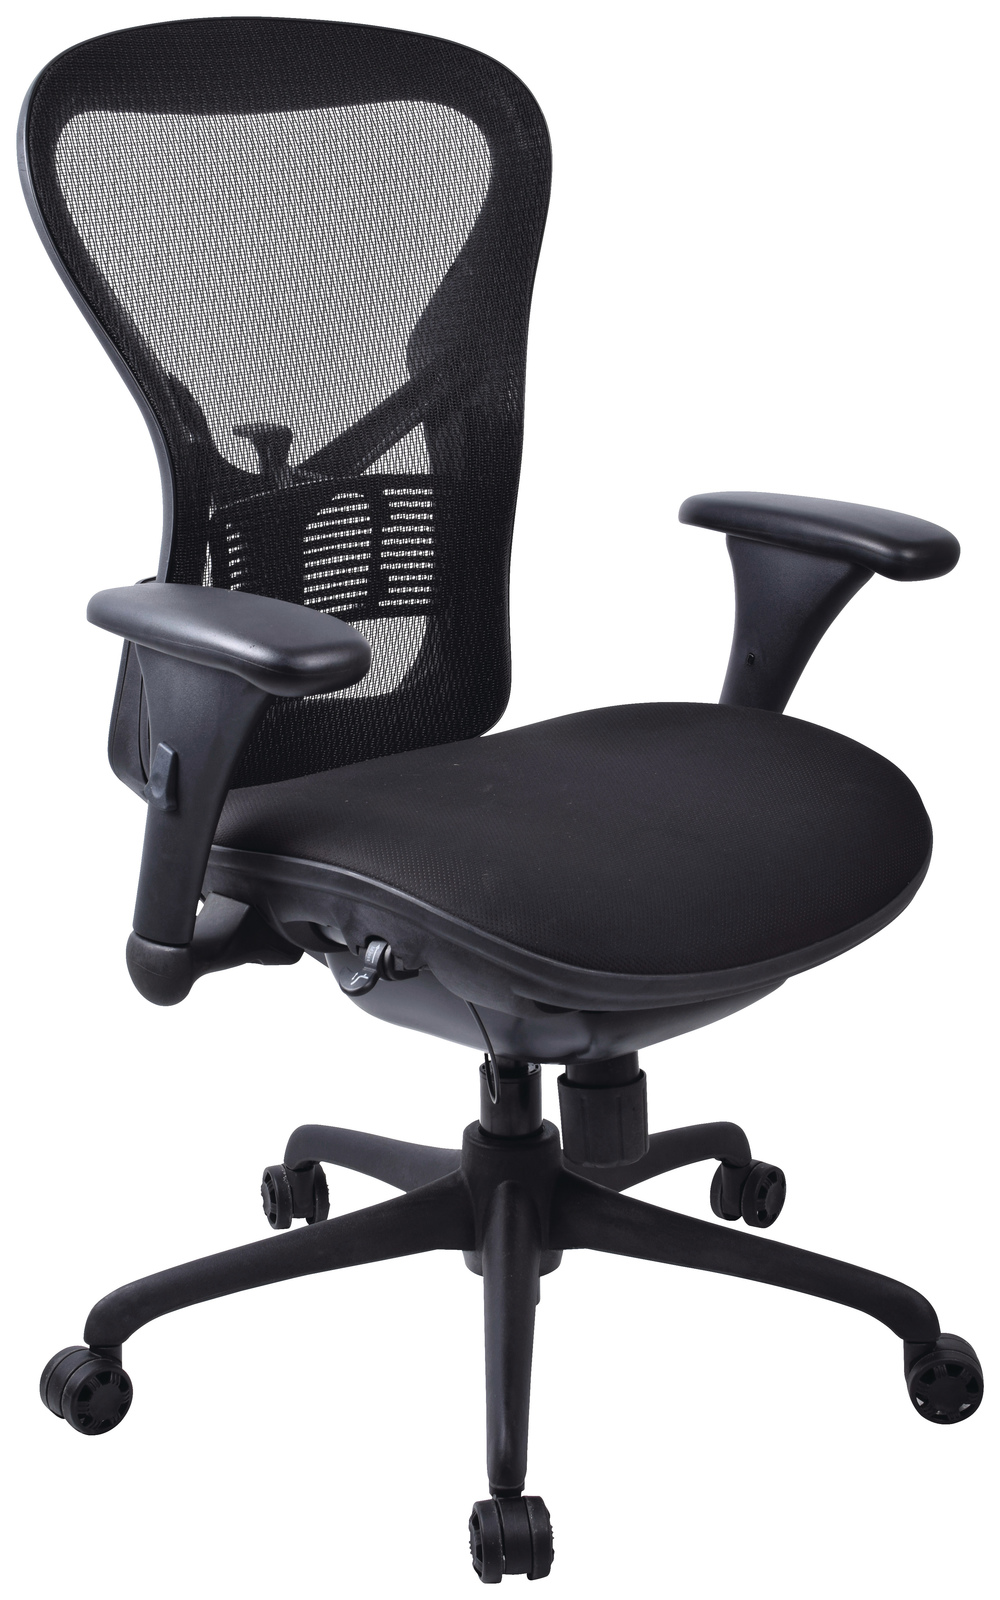 Workpro Operator Slide Mesh Back Chair (Black) image